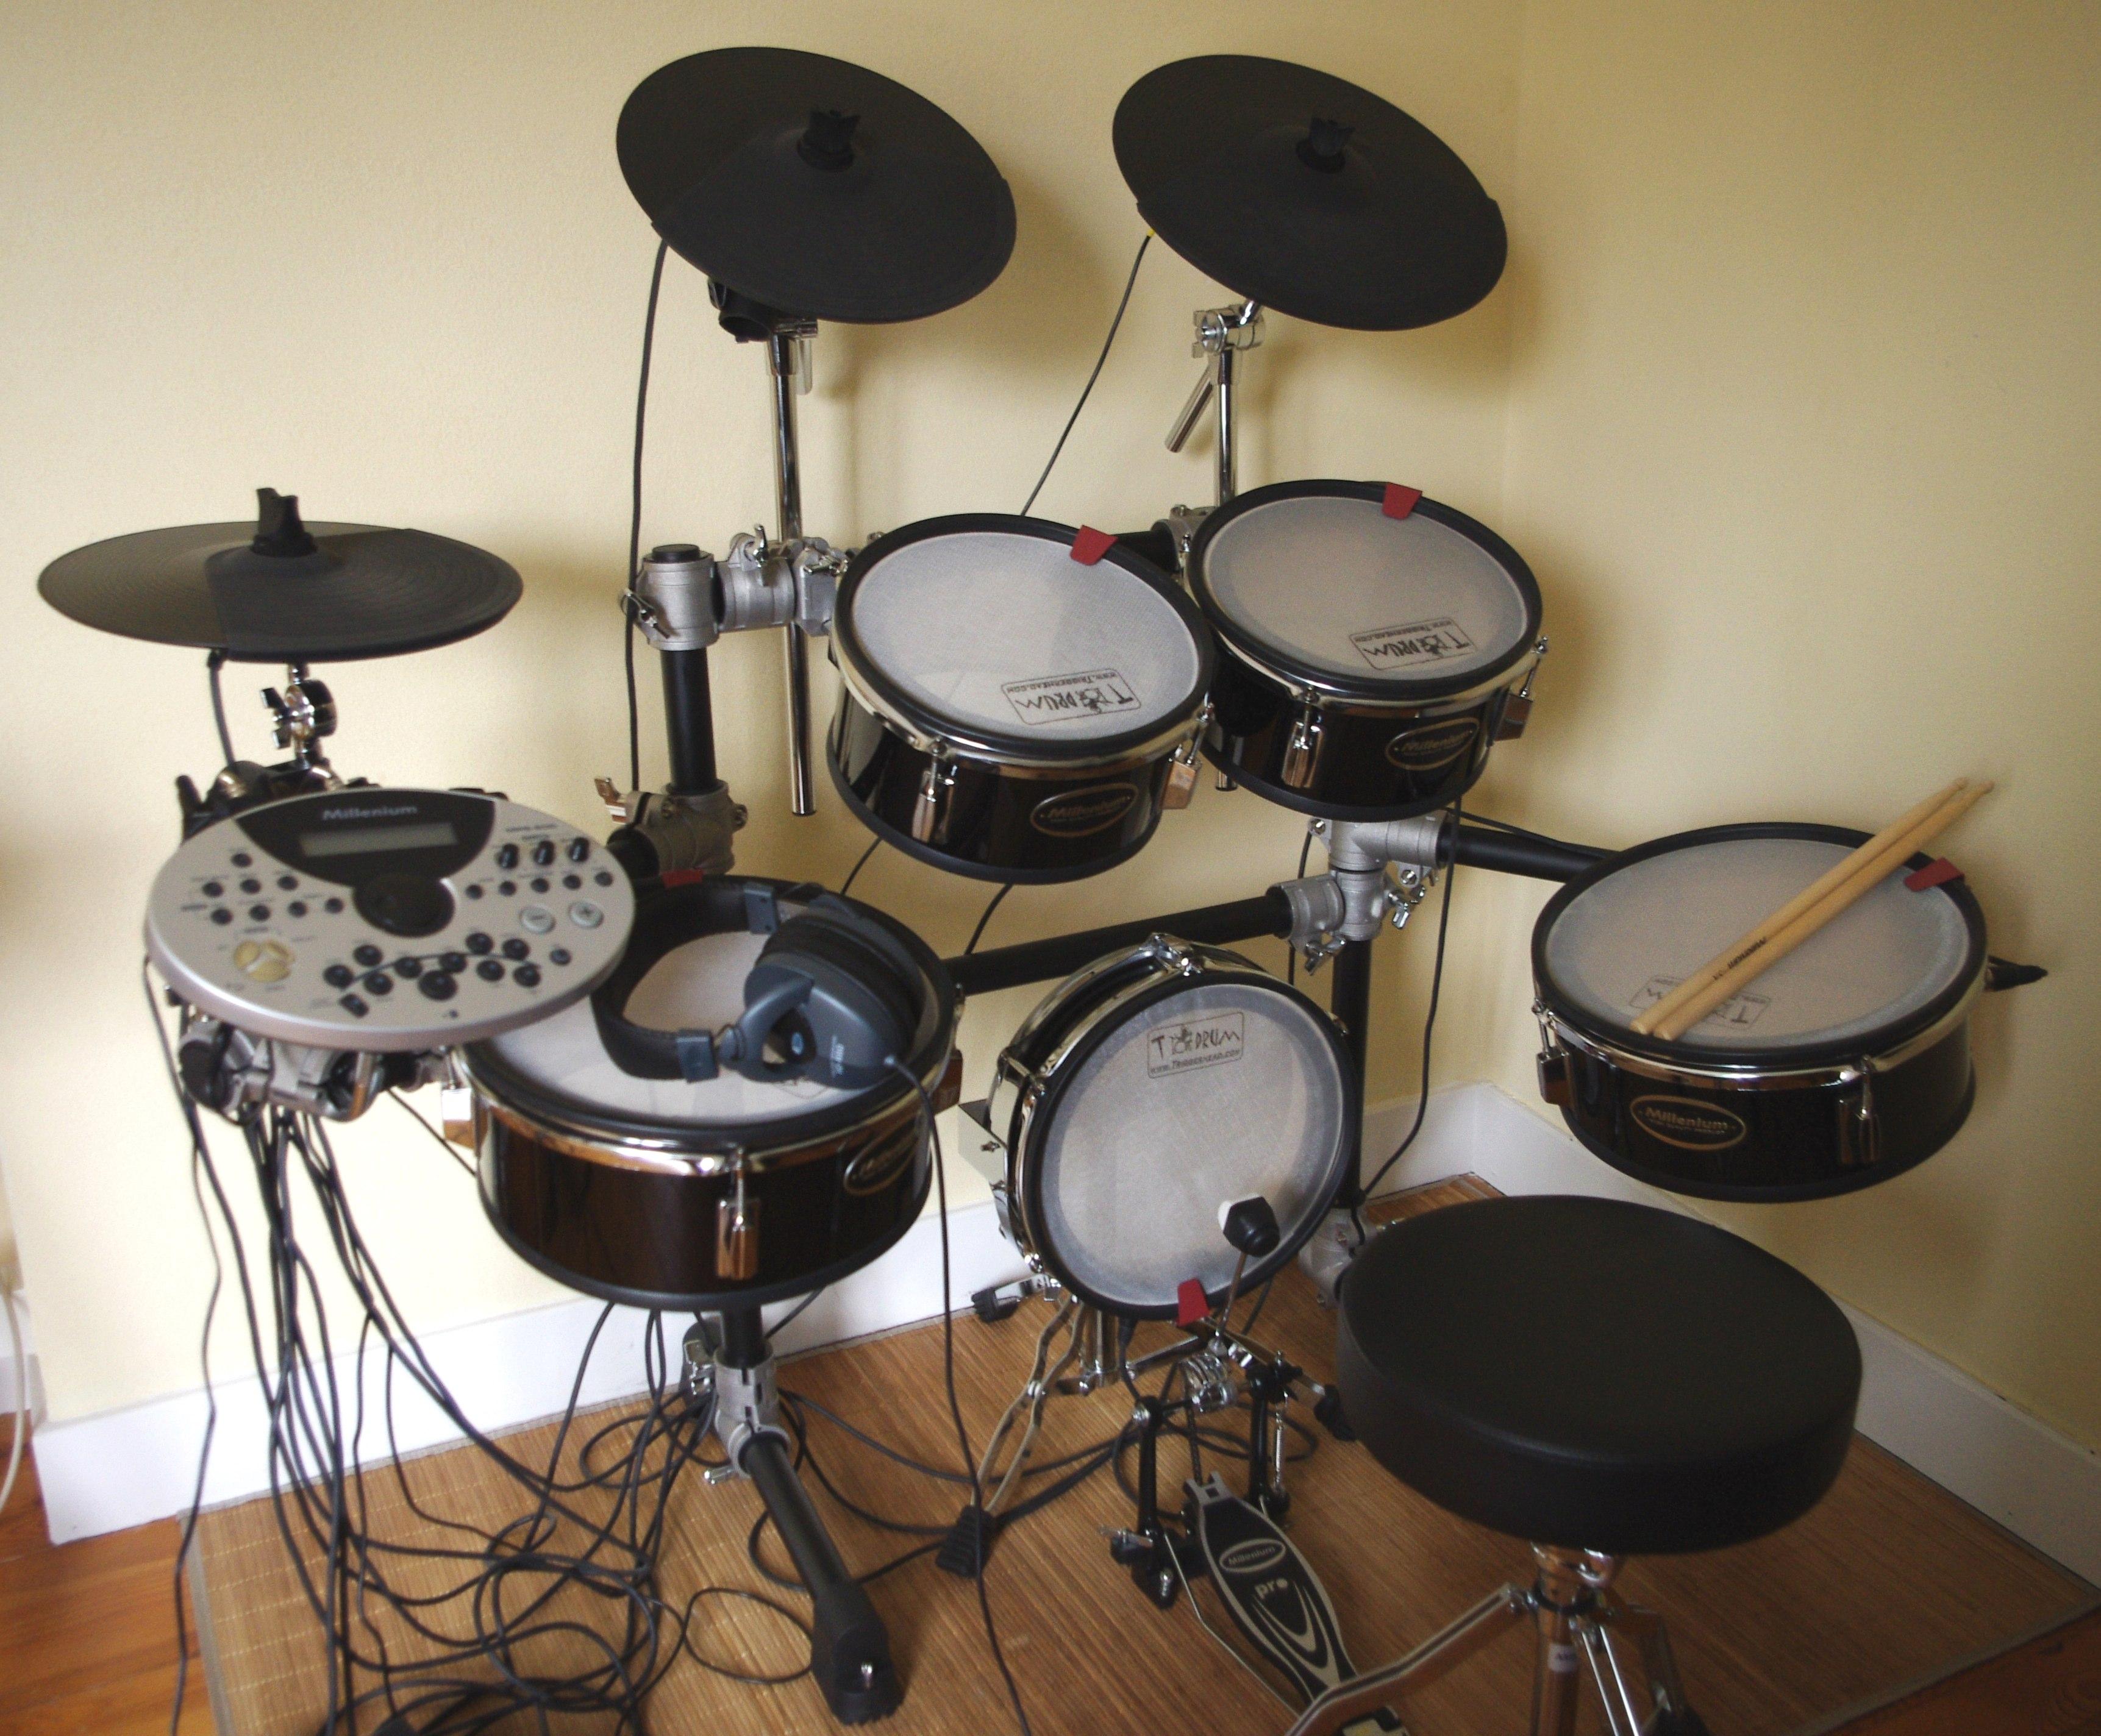 photo millenium mps 600 e drum set millenium millenium mesh head mps 600 e drum set 572402. Black Bedroom Furniture Sets. Home Design Ideas